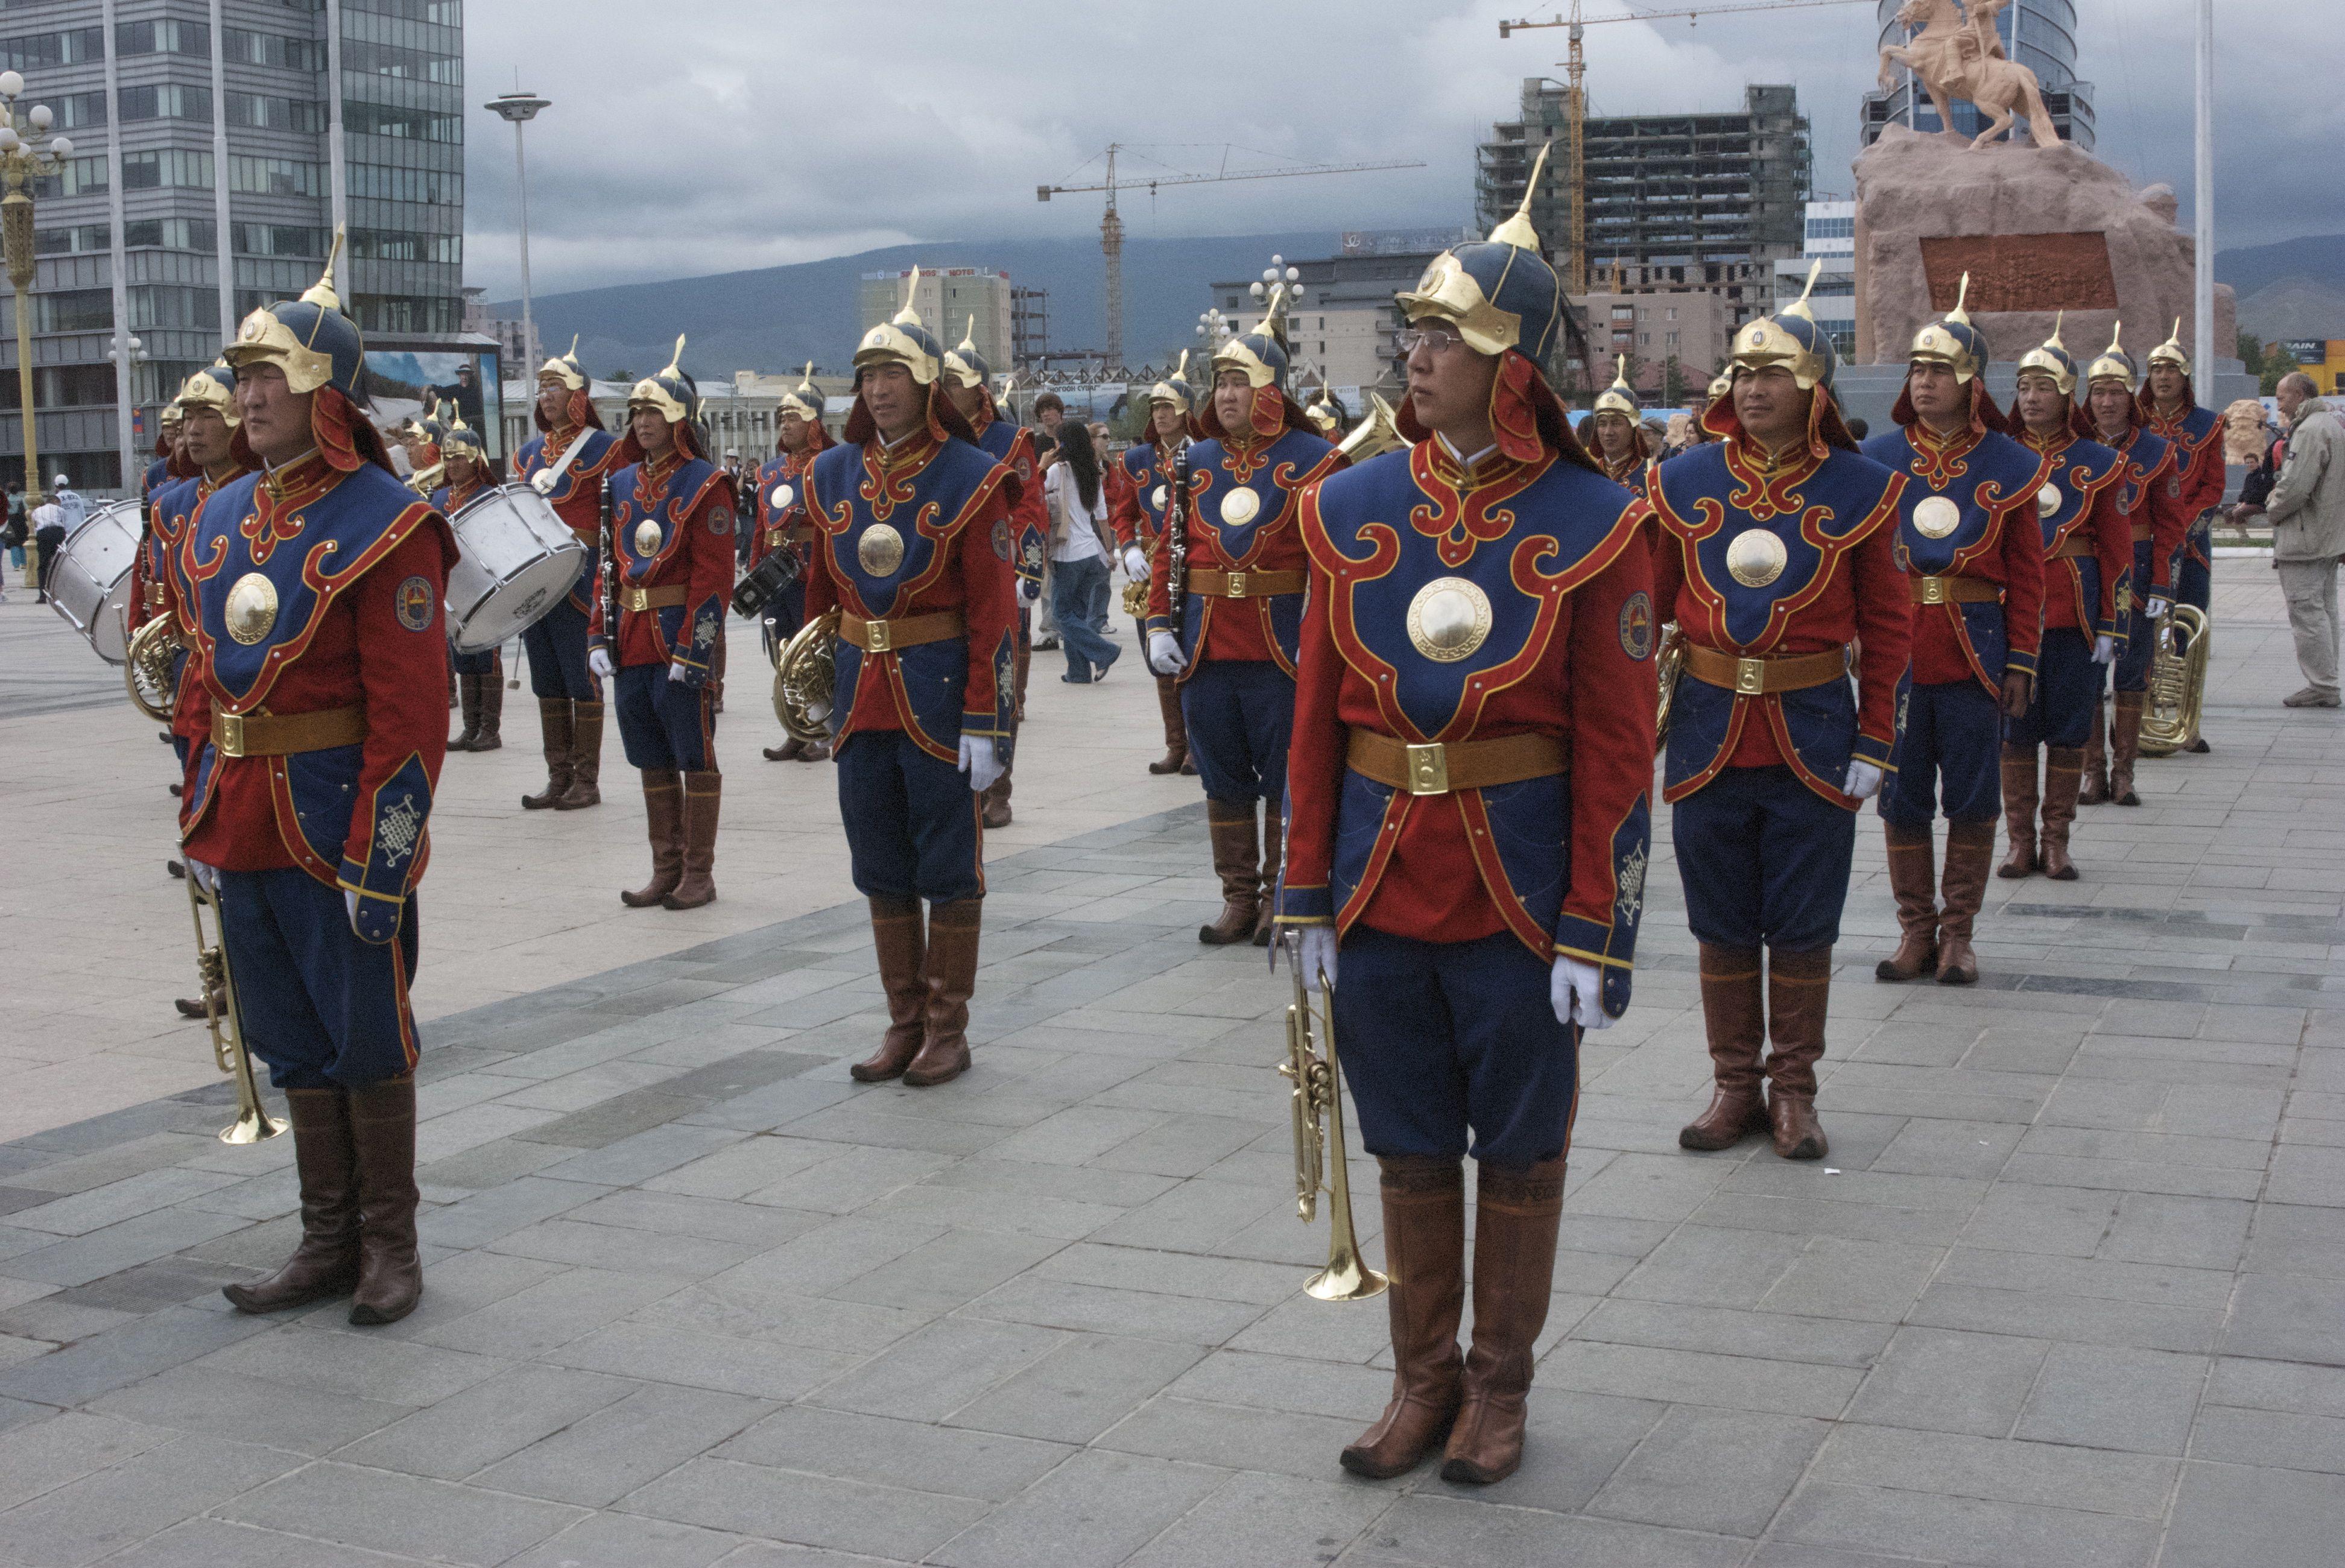 Start of national Naadam ceremony at Sukhbaatar Square, Ulaanbaatar; the band